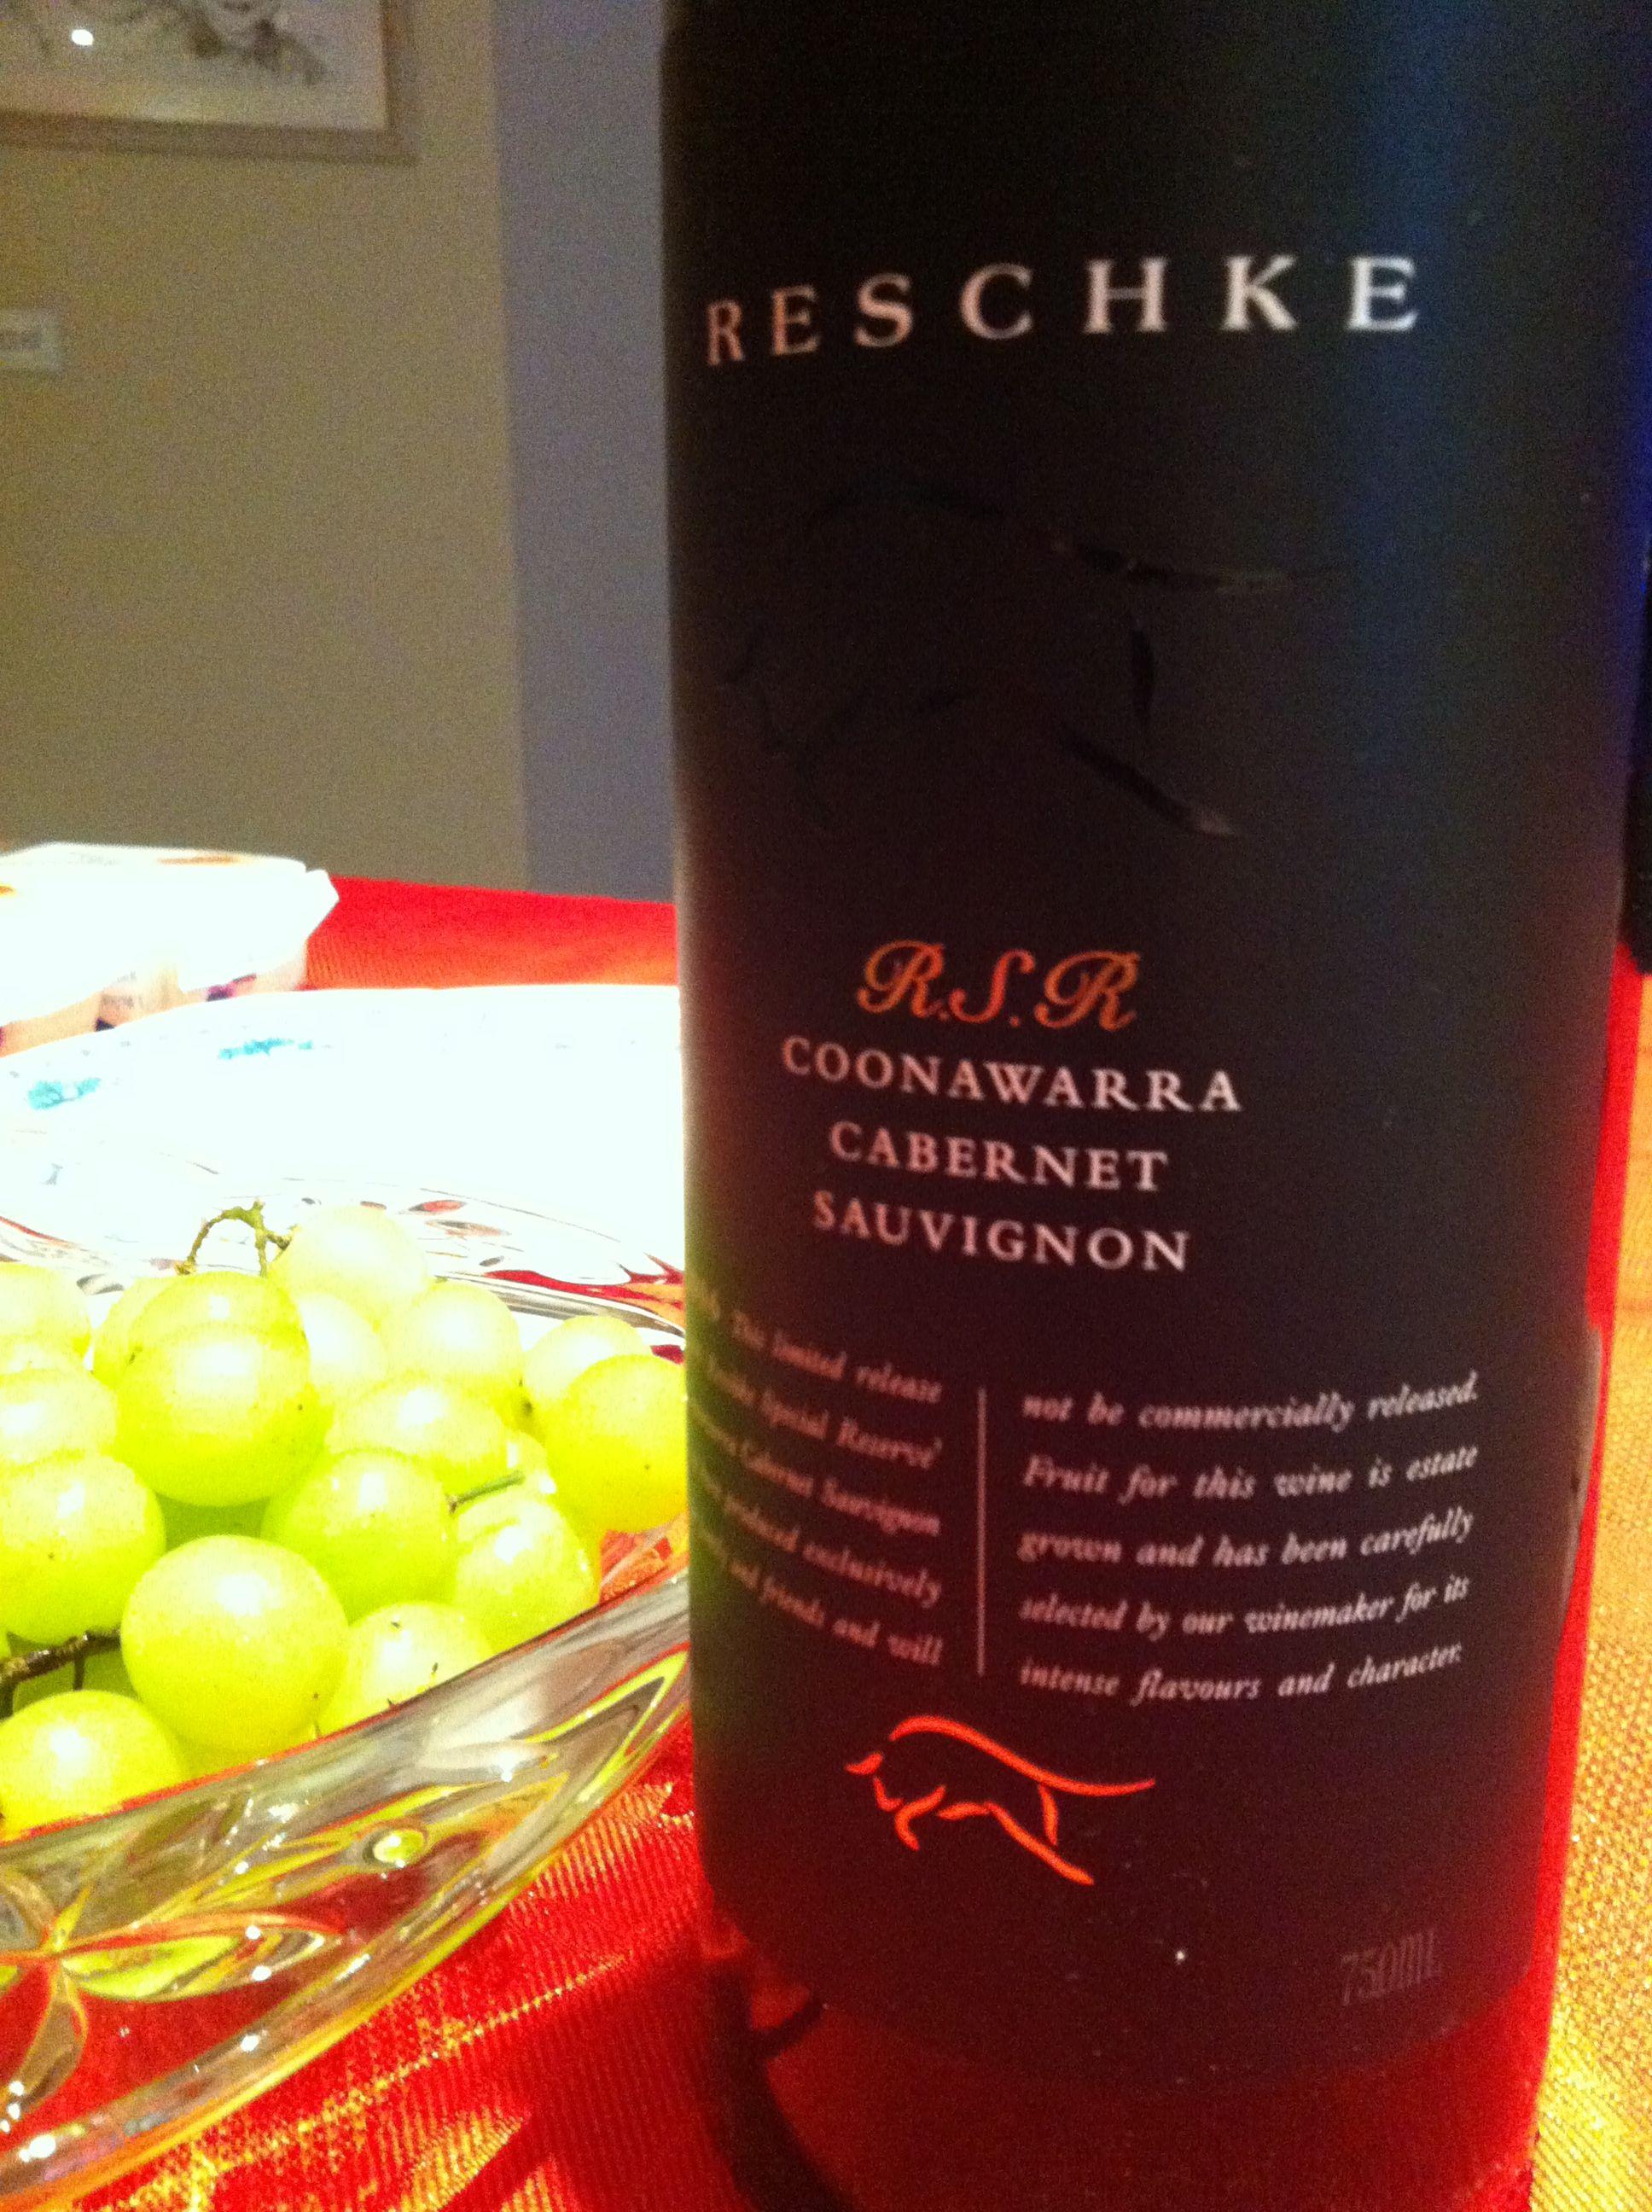 2006 Reschke Coonawarra Cabernet Sauvignon Rsr It S Christmas So Spoil Yourselves It S A Special Reserve Delicious Cabernet Sauvignon Winemaking Sauvignon